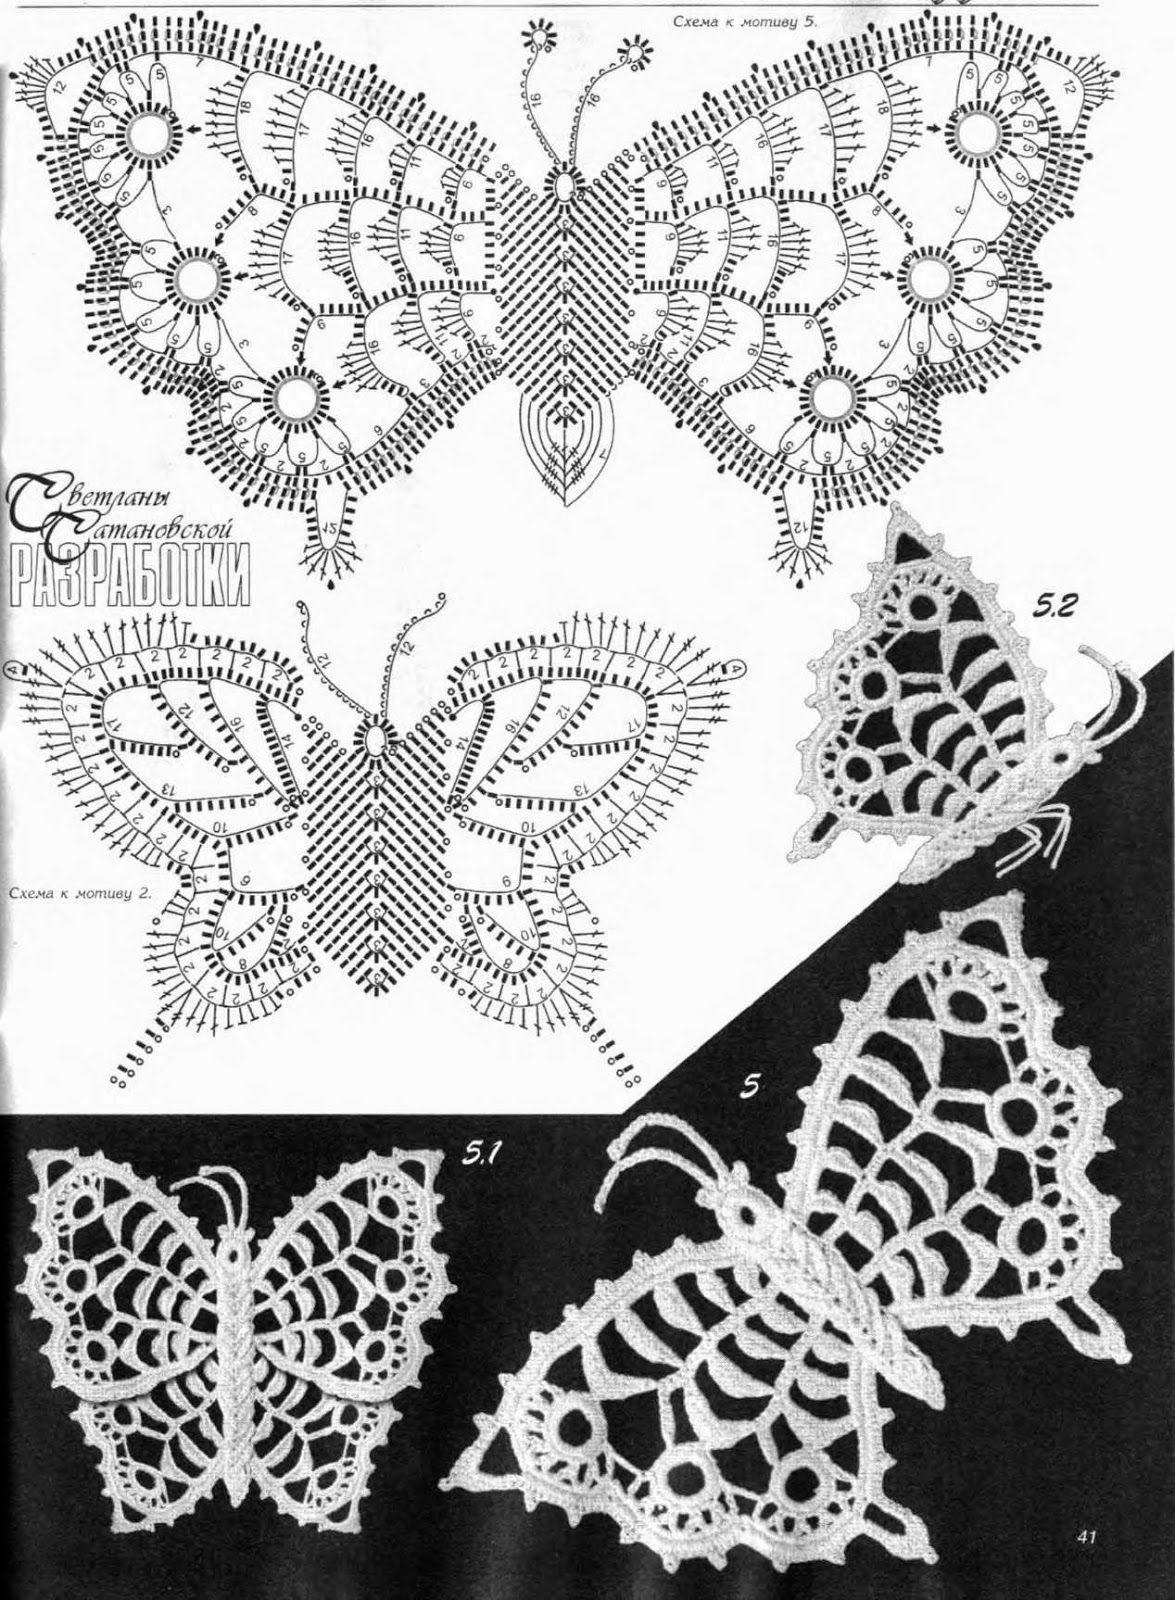 Mariposas crochet patron | mariposas y libélulas | Pinterest ...